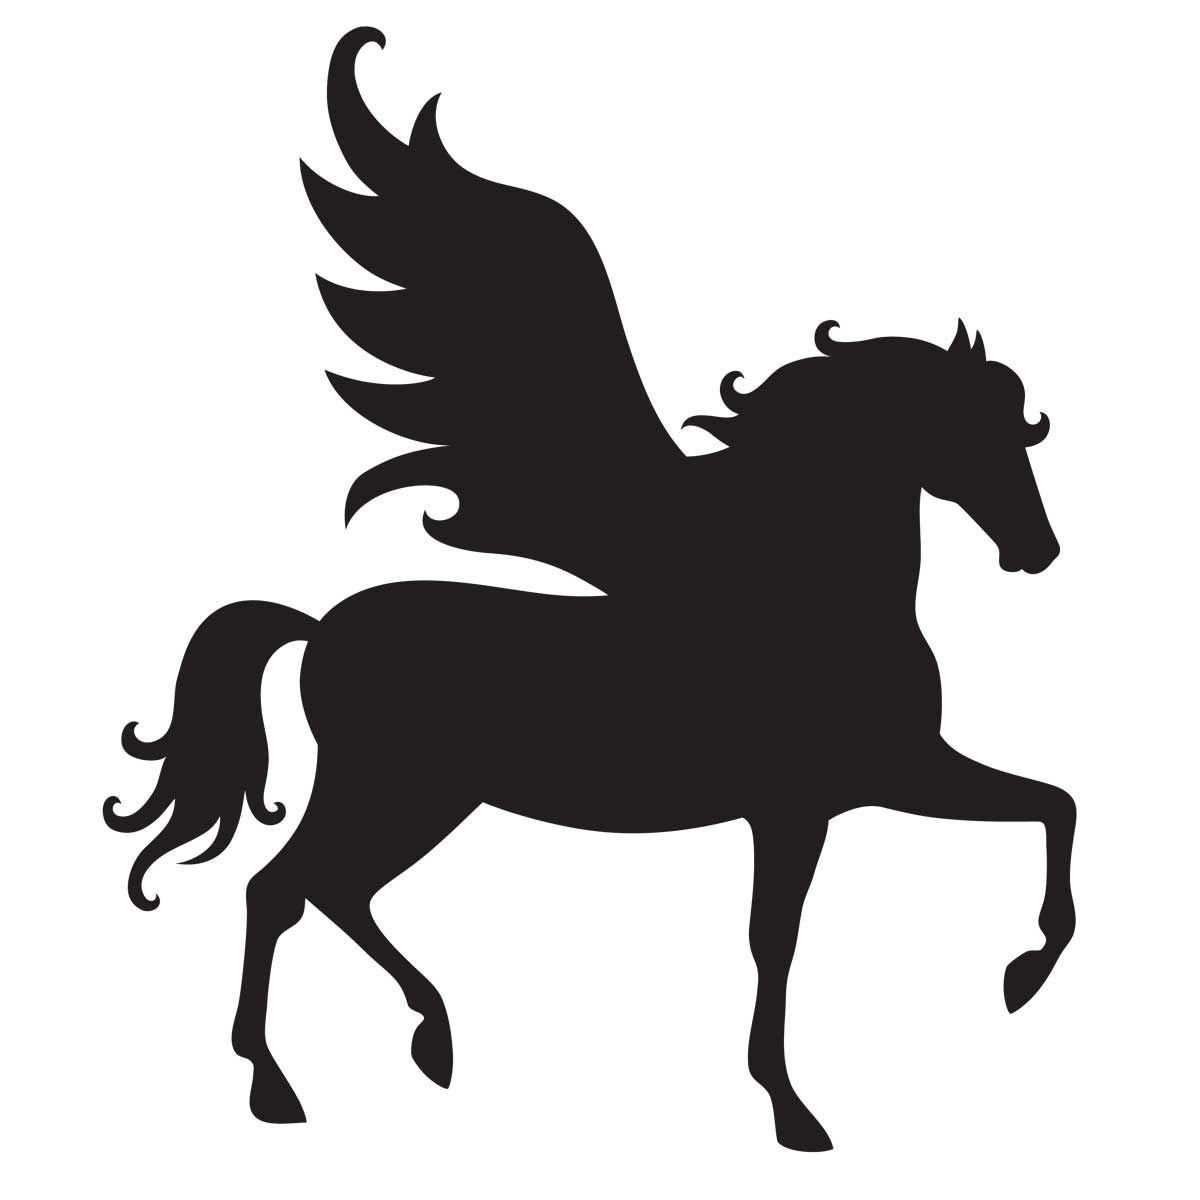 Pegasus Stencil Google Search Stencils Pinterest